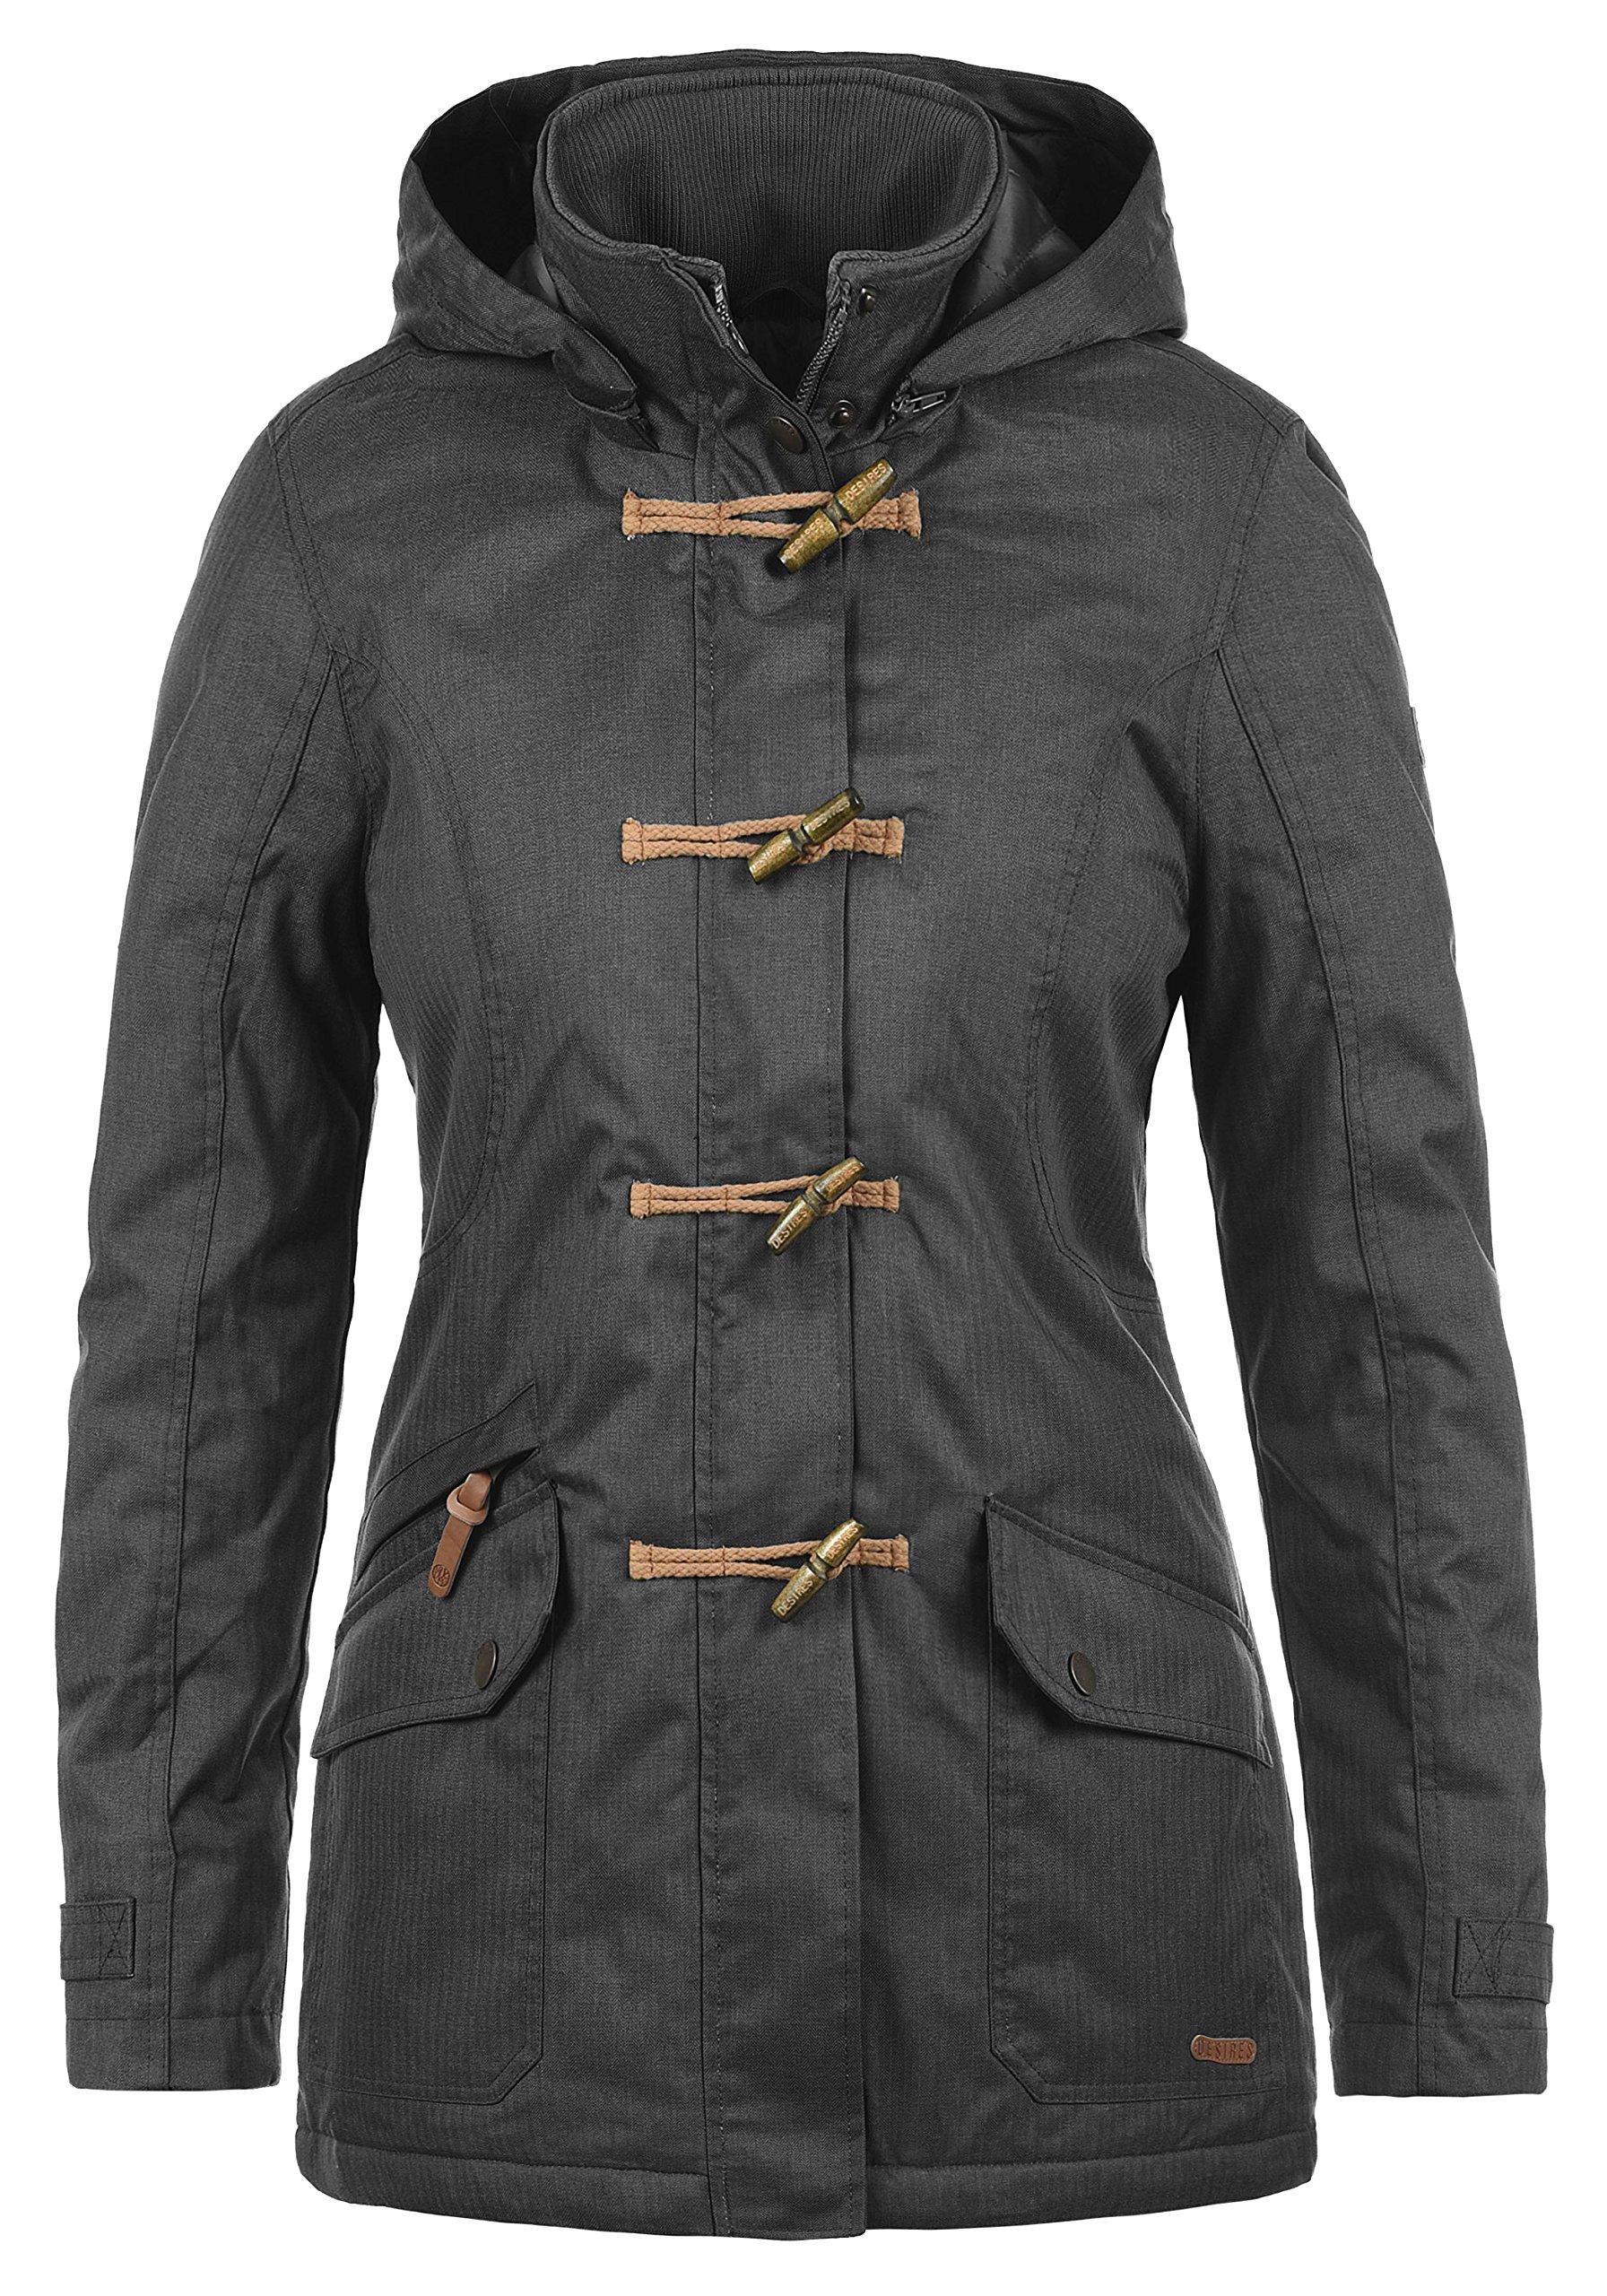 Desires Brooke Duffle-Coat Abrigo Chaqueta De Invierno para Mujer con  Cuello Alto product image 4596e51b4c24